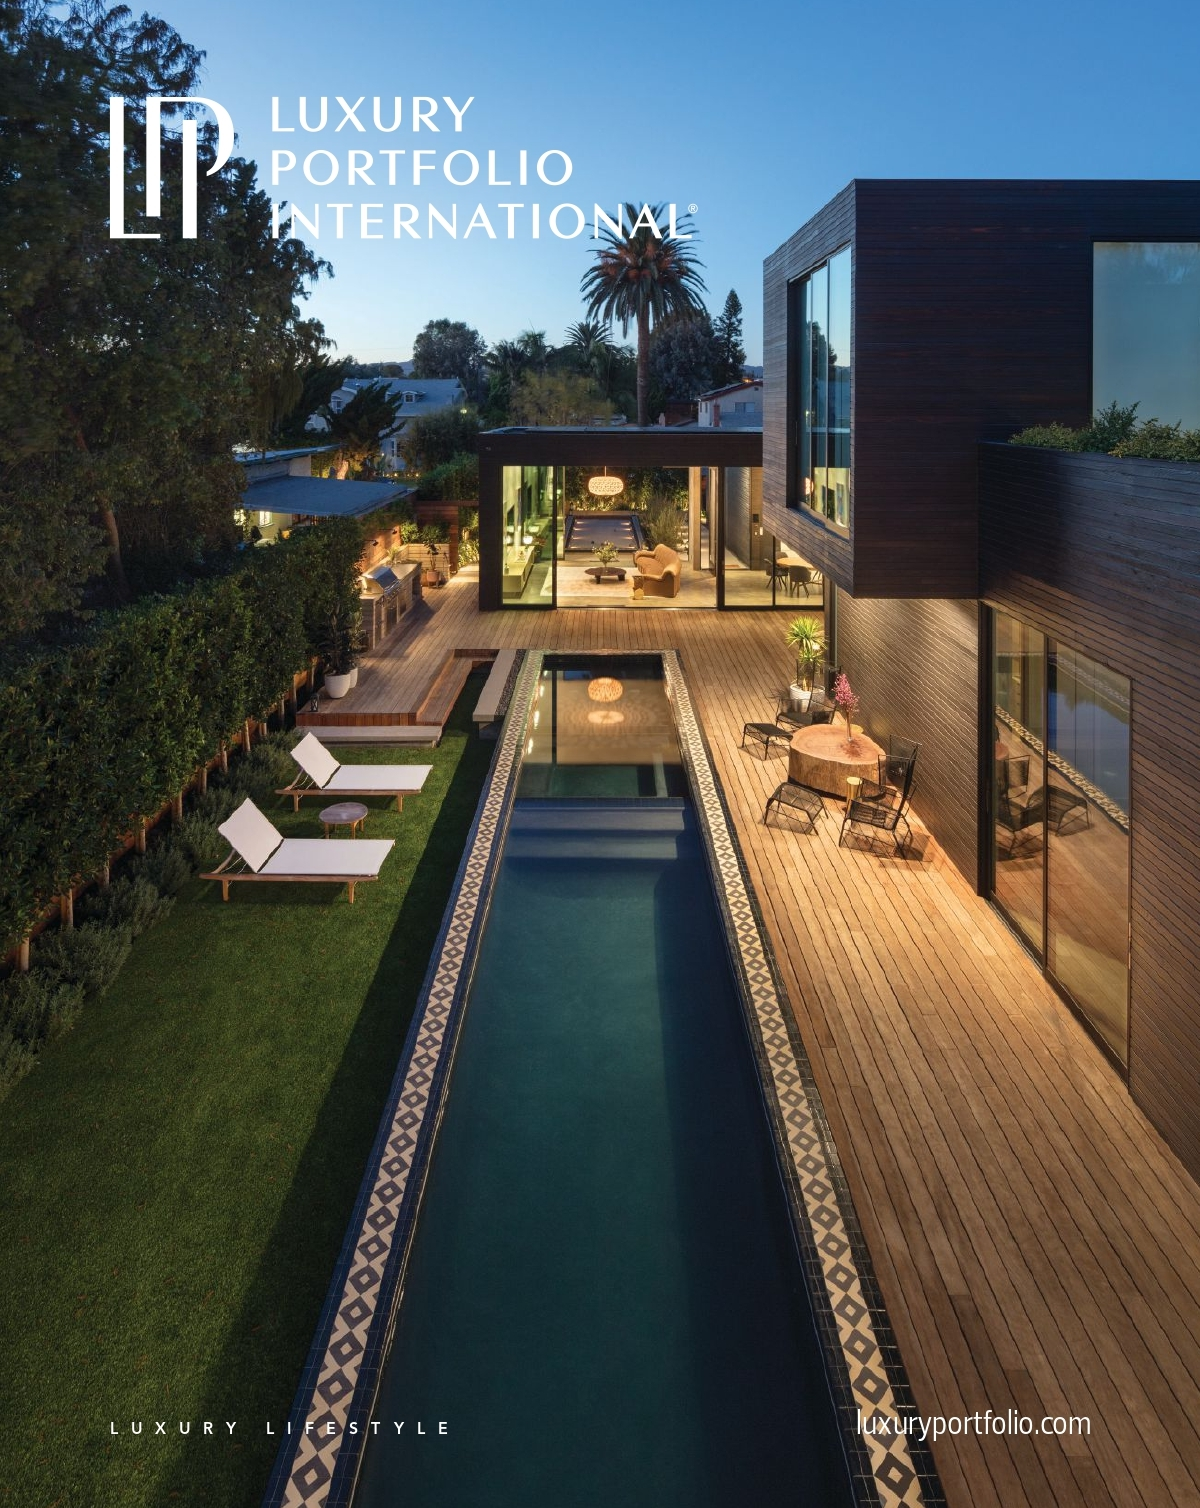 Luxury Portfolio Magazine-September Online Issue is Available